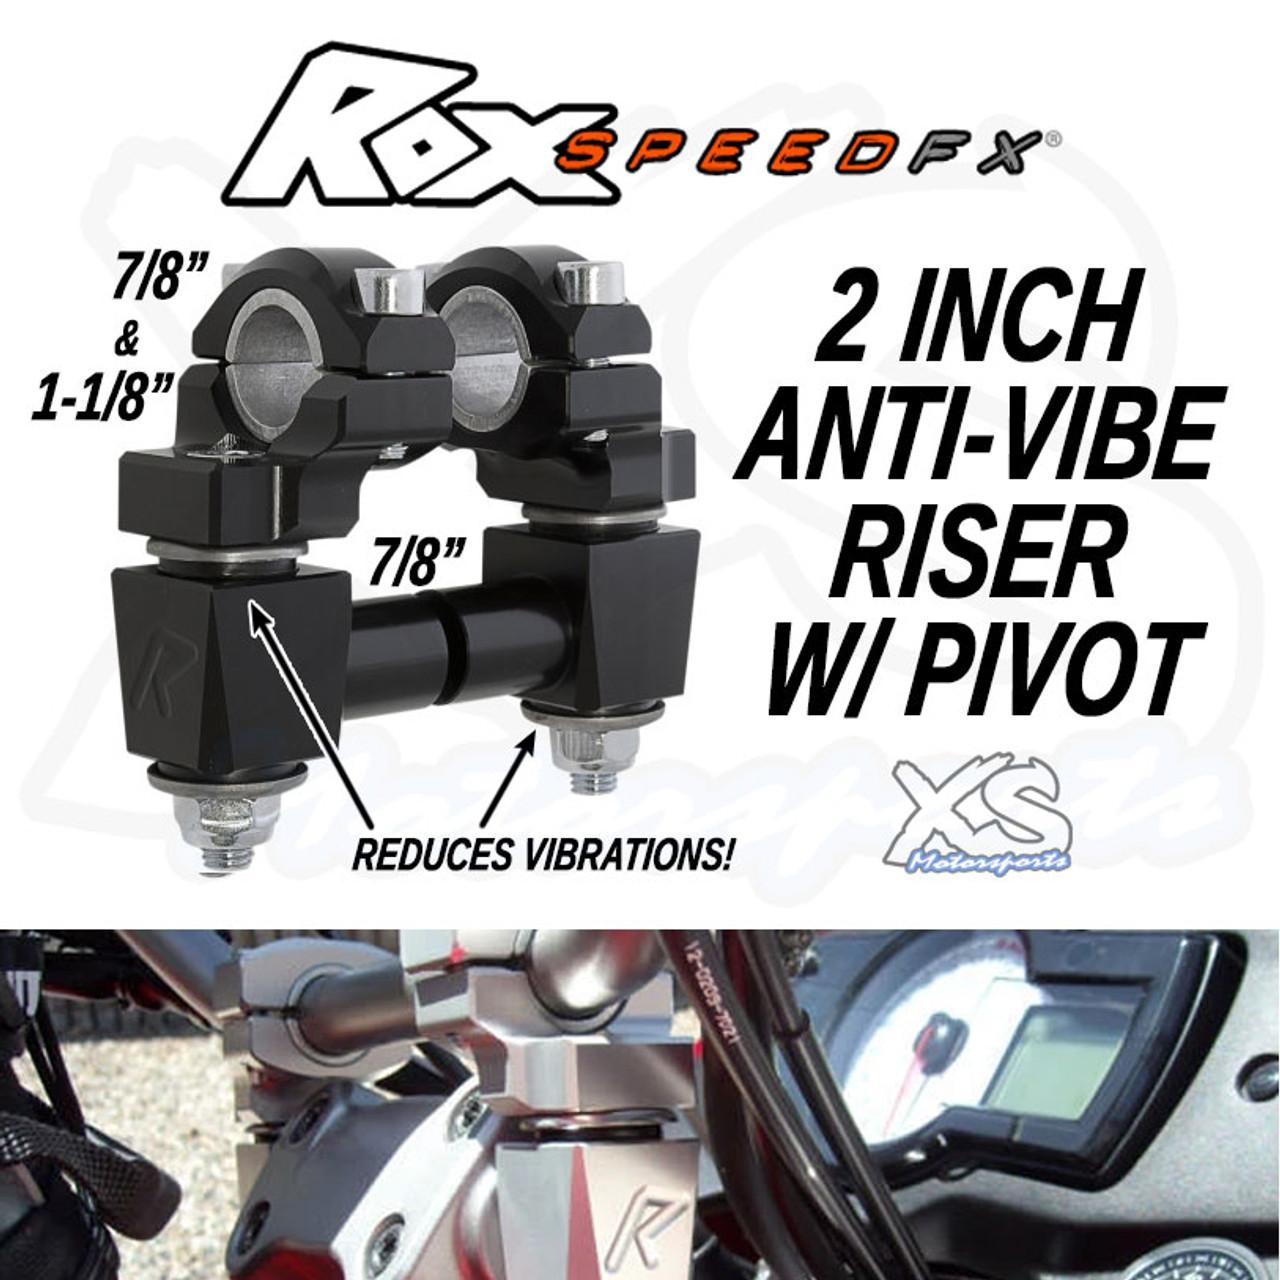 "Rox Speed FX Elite Series Anti-Vibration 2/"" Inch Pivot Risers"